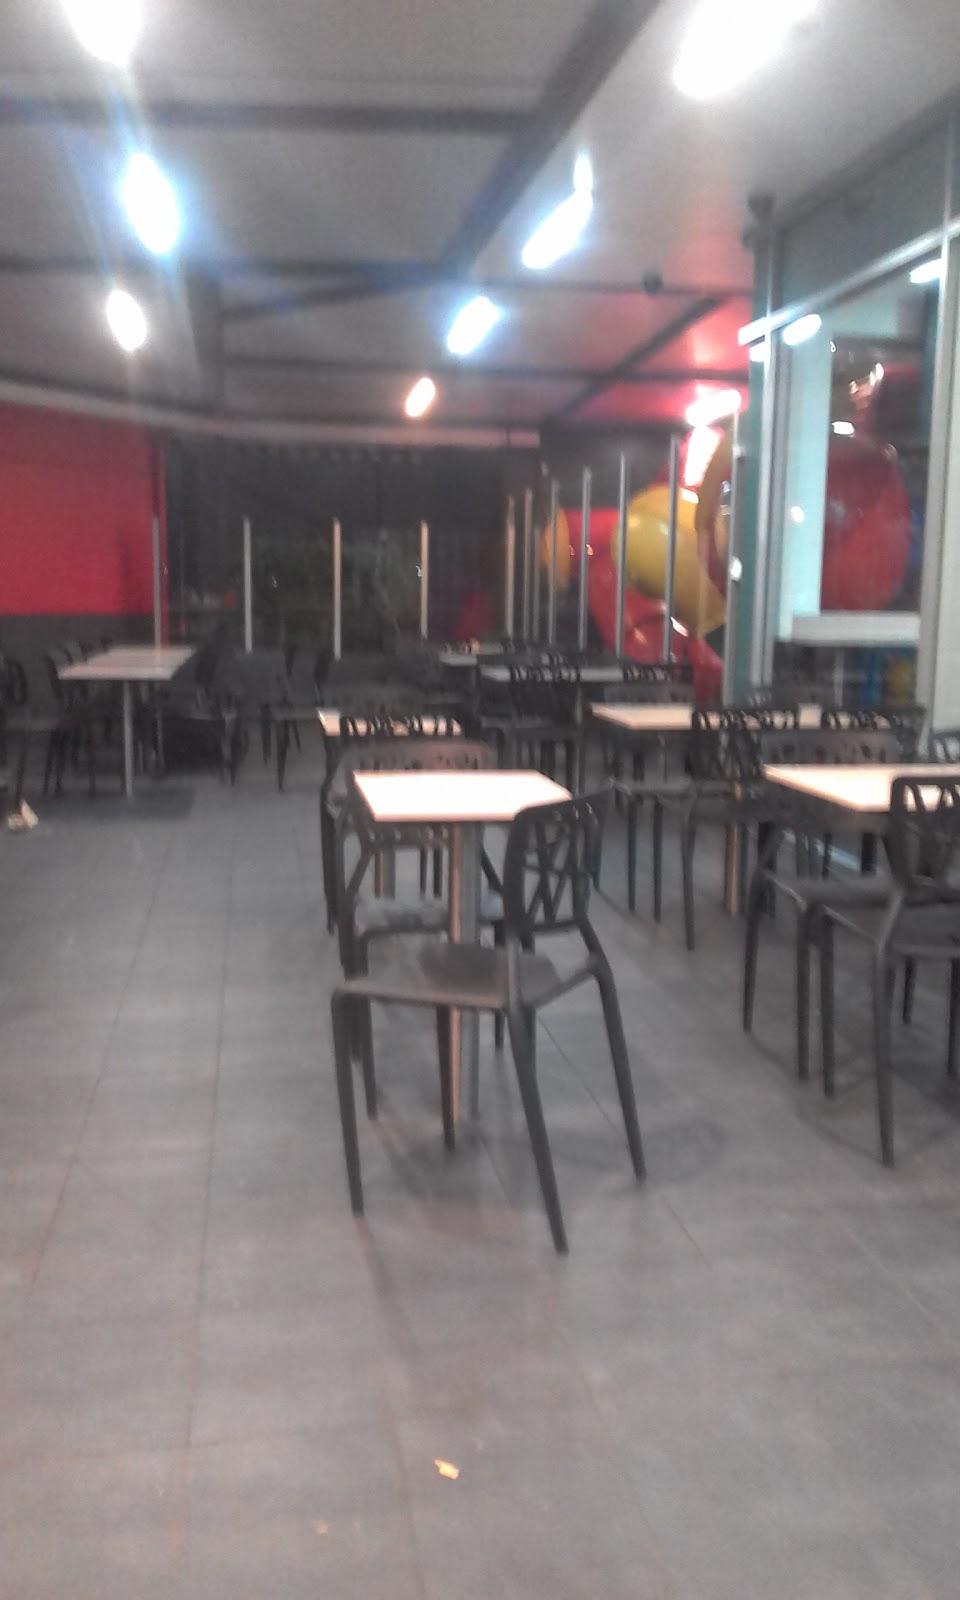 McDonalds Emerton II | meal takeaway | 151 Popondetta Rd, Emerton NSW 2770, Australia | 0296257952 OR +61 2 9625 7952